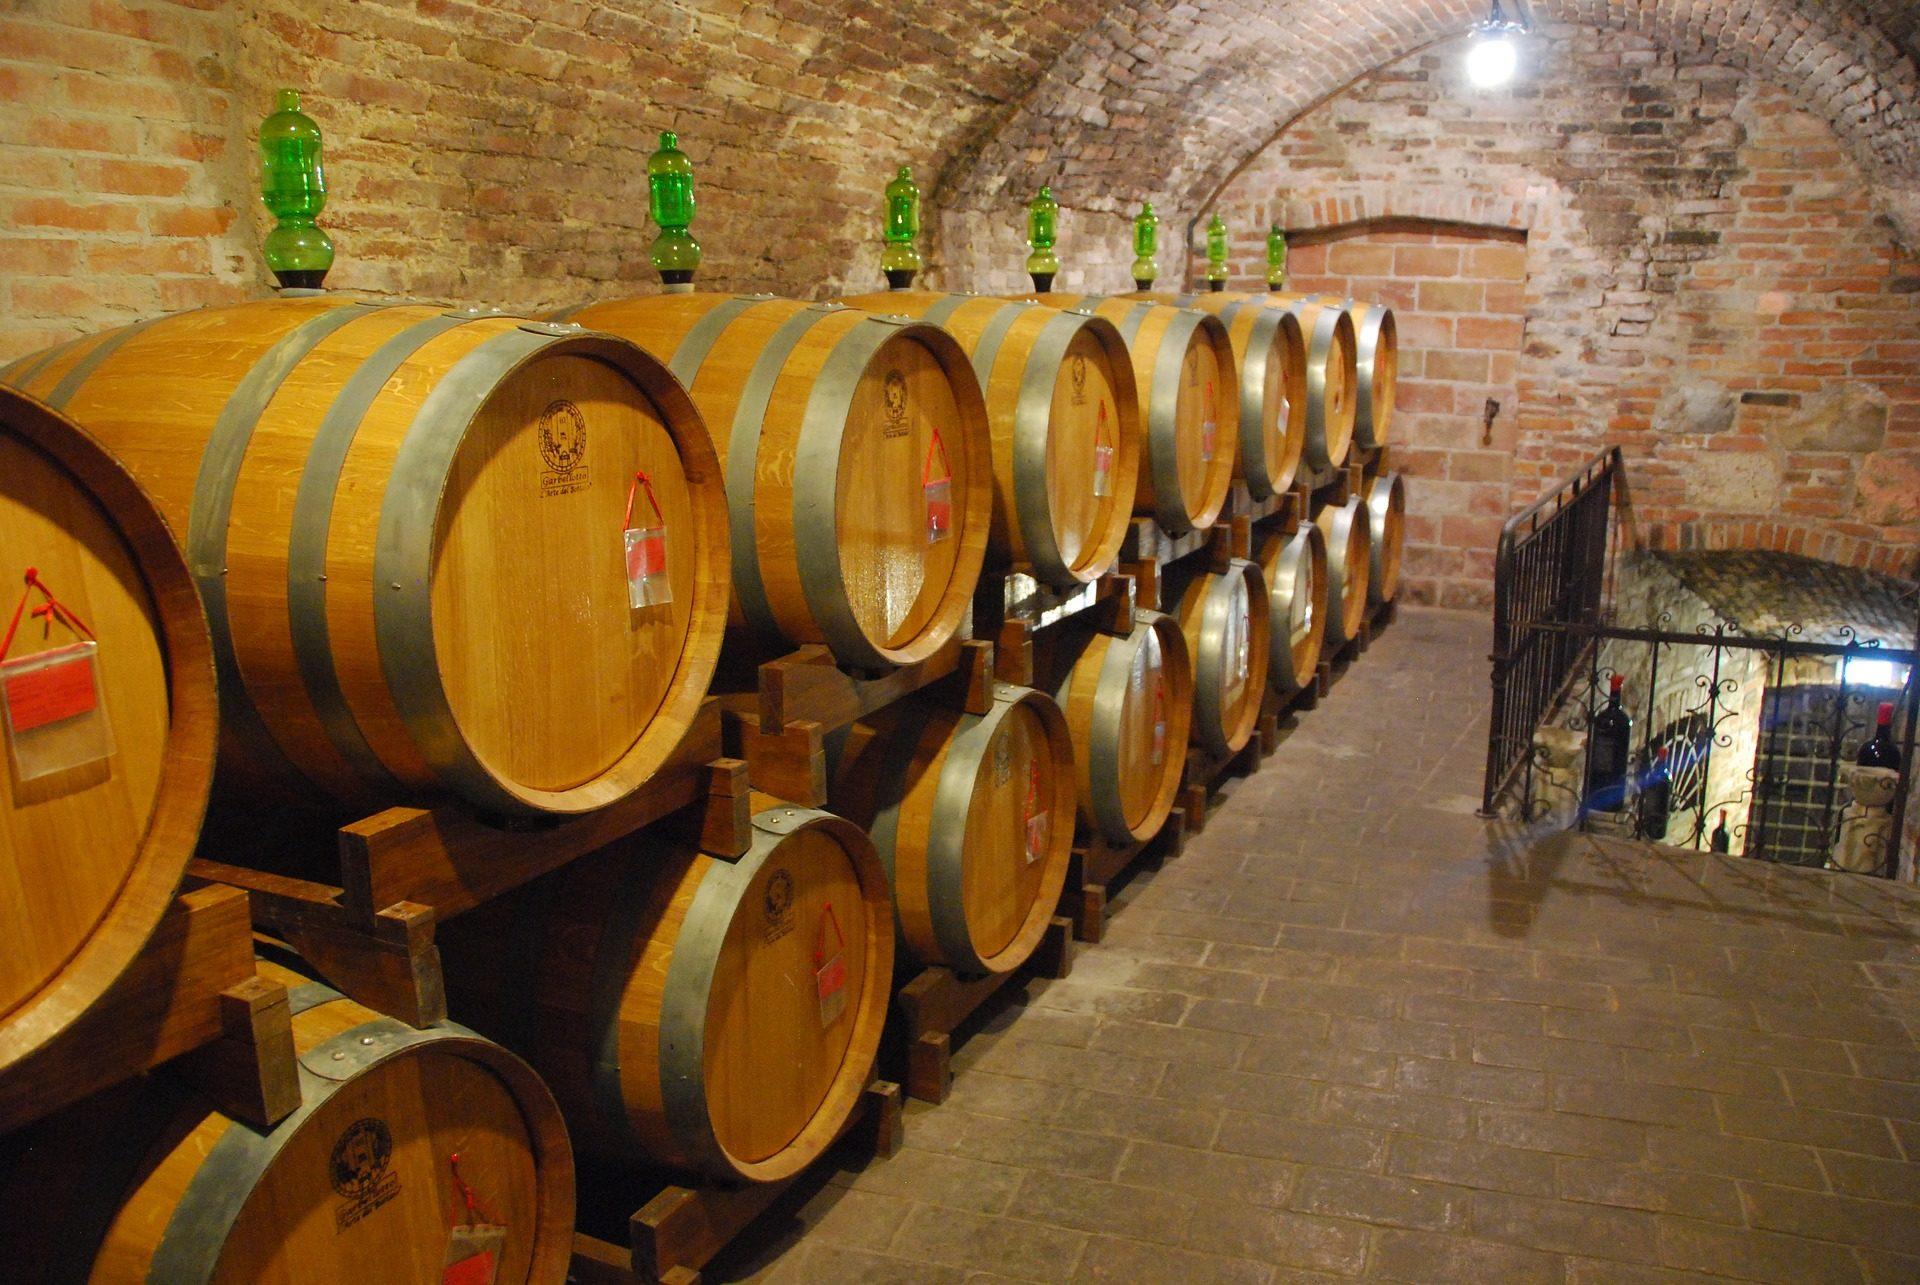 barriles, barricas, शराब, bodega, fermentación, टस्कन - HD वॉलपेपर - प्रोफेसर-falken.com